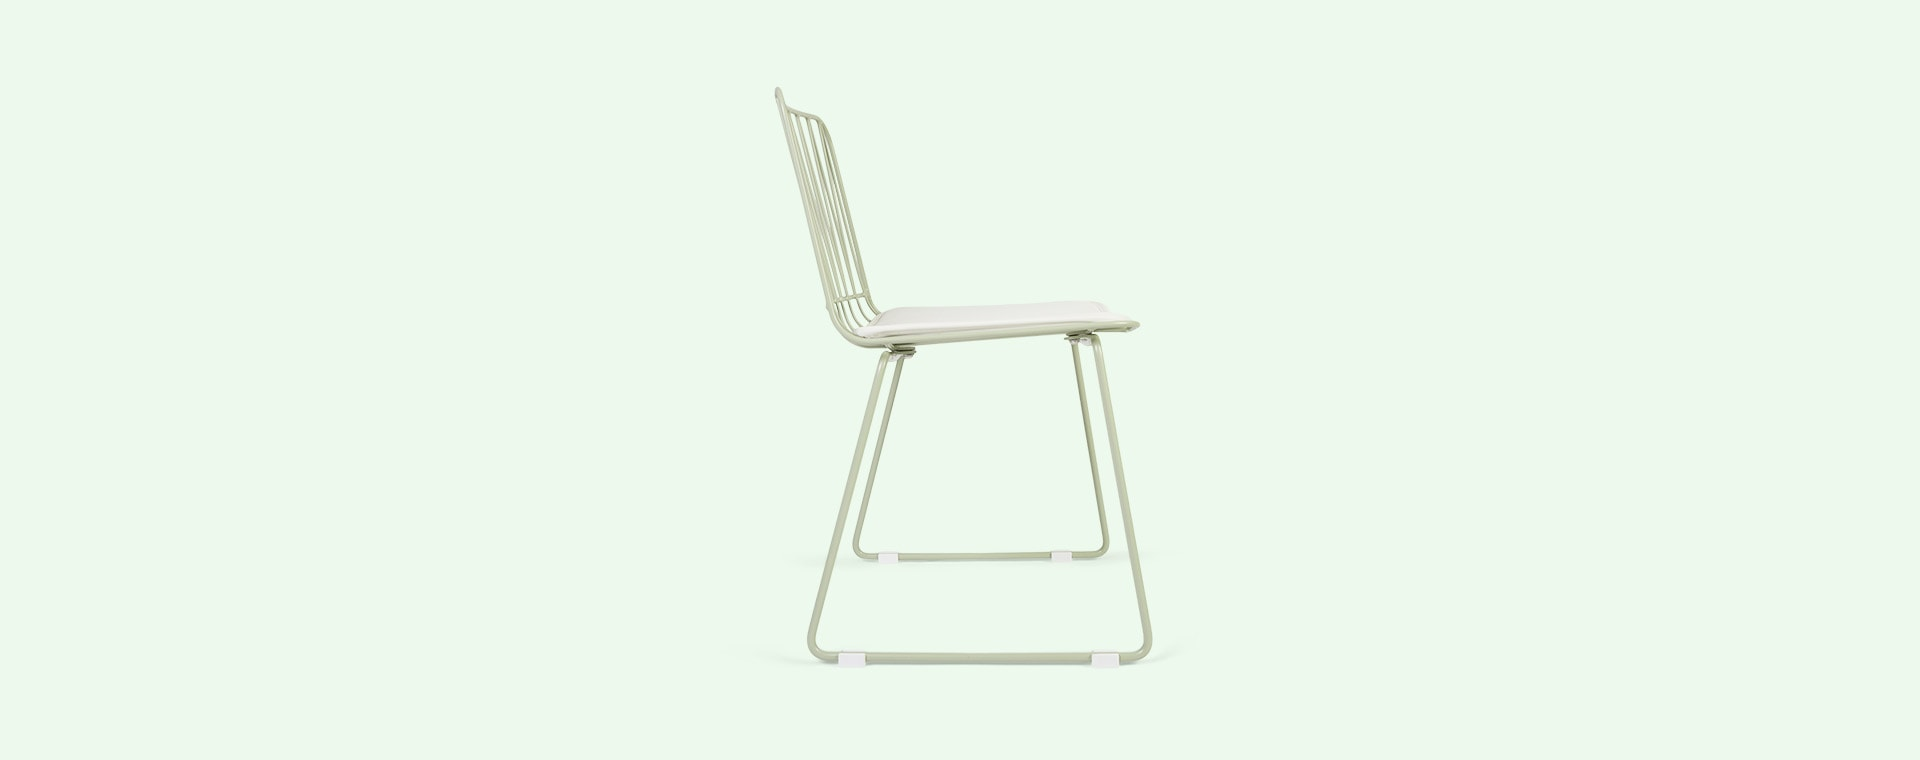 Seagreen Kids Depot Metal Chair Set of 2